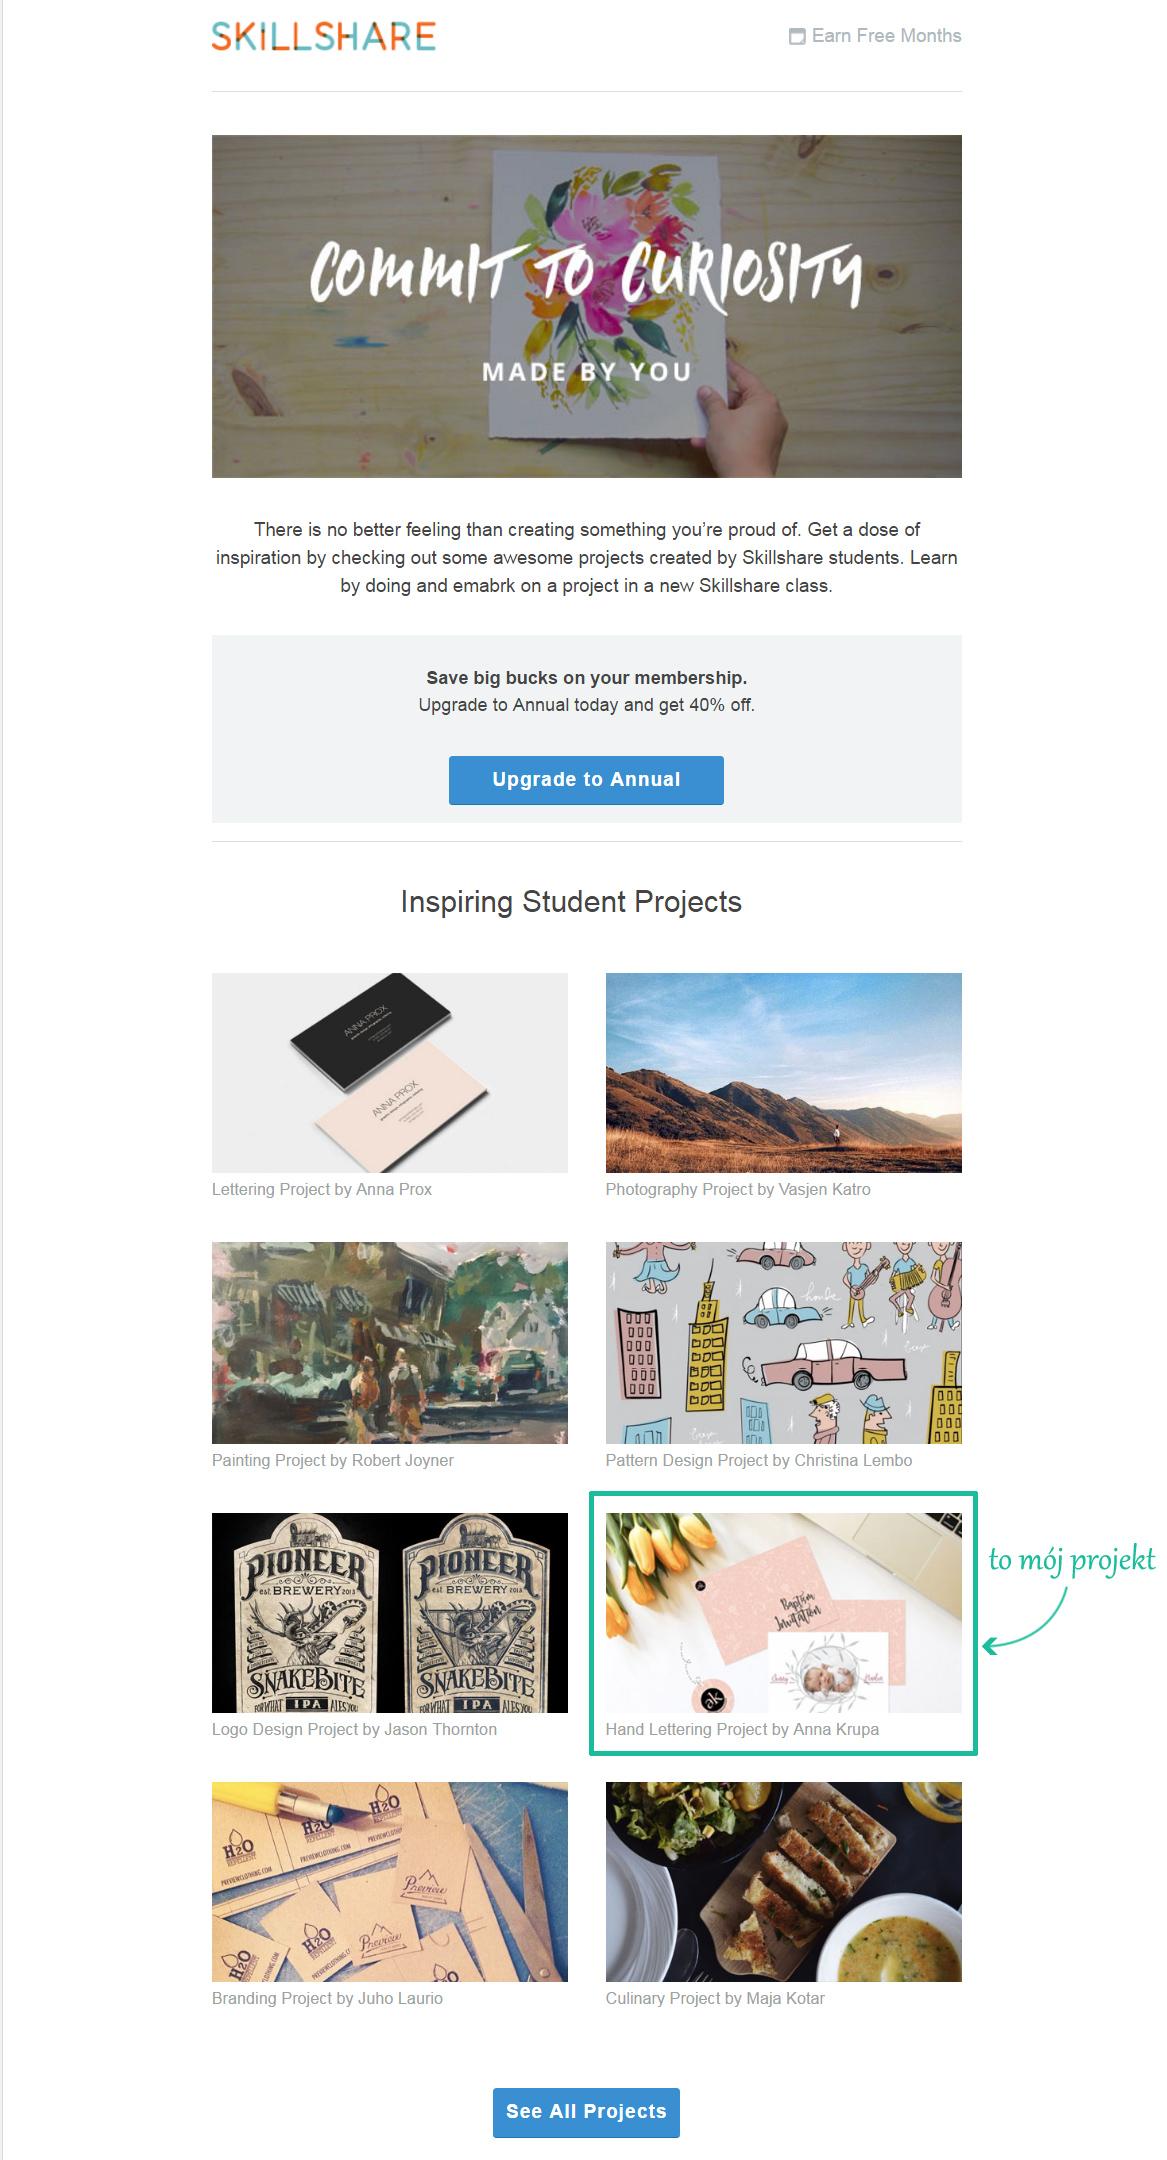 Inspiring Students Project at Skillshare (January 2017)